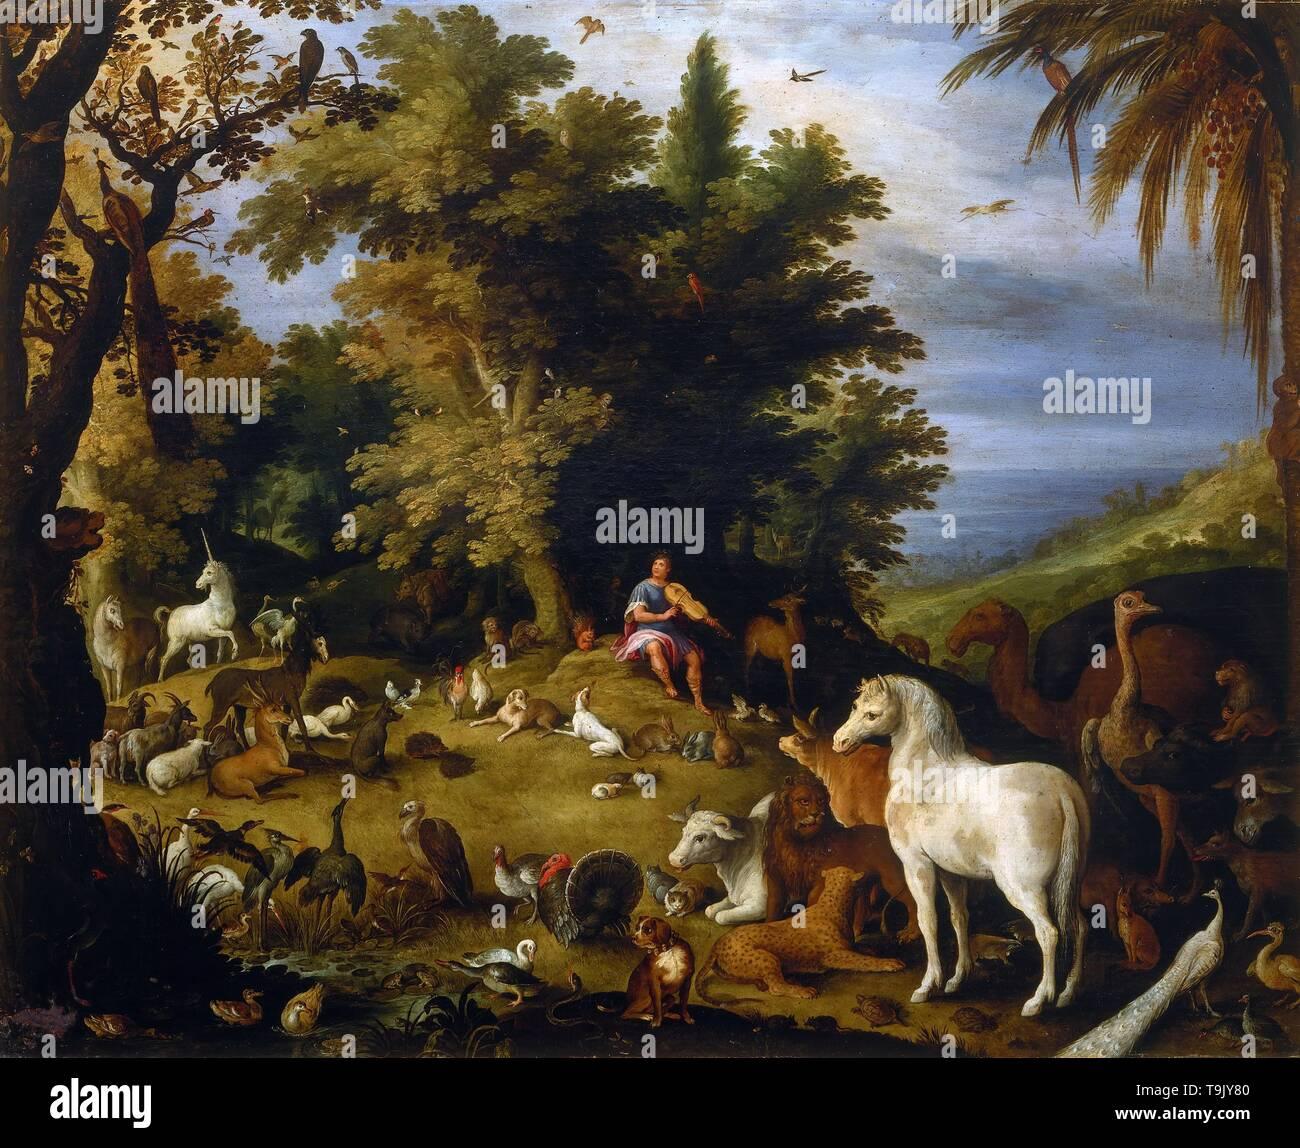 Orpheus among the animals. Museum: Galleria Borghese, Rome. Author: Sebastiaen Vrancx. - Stock Image